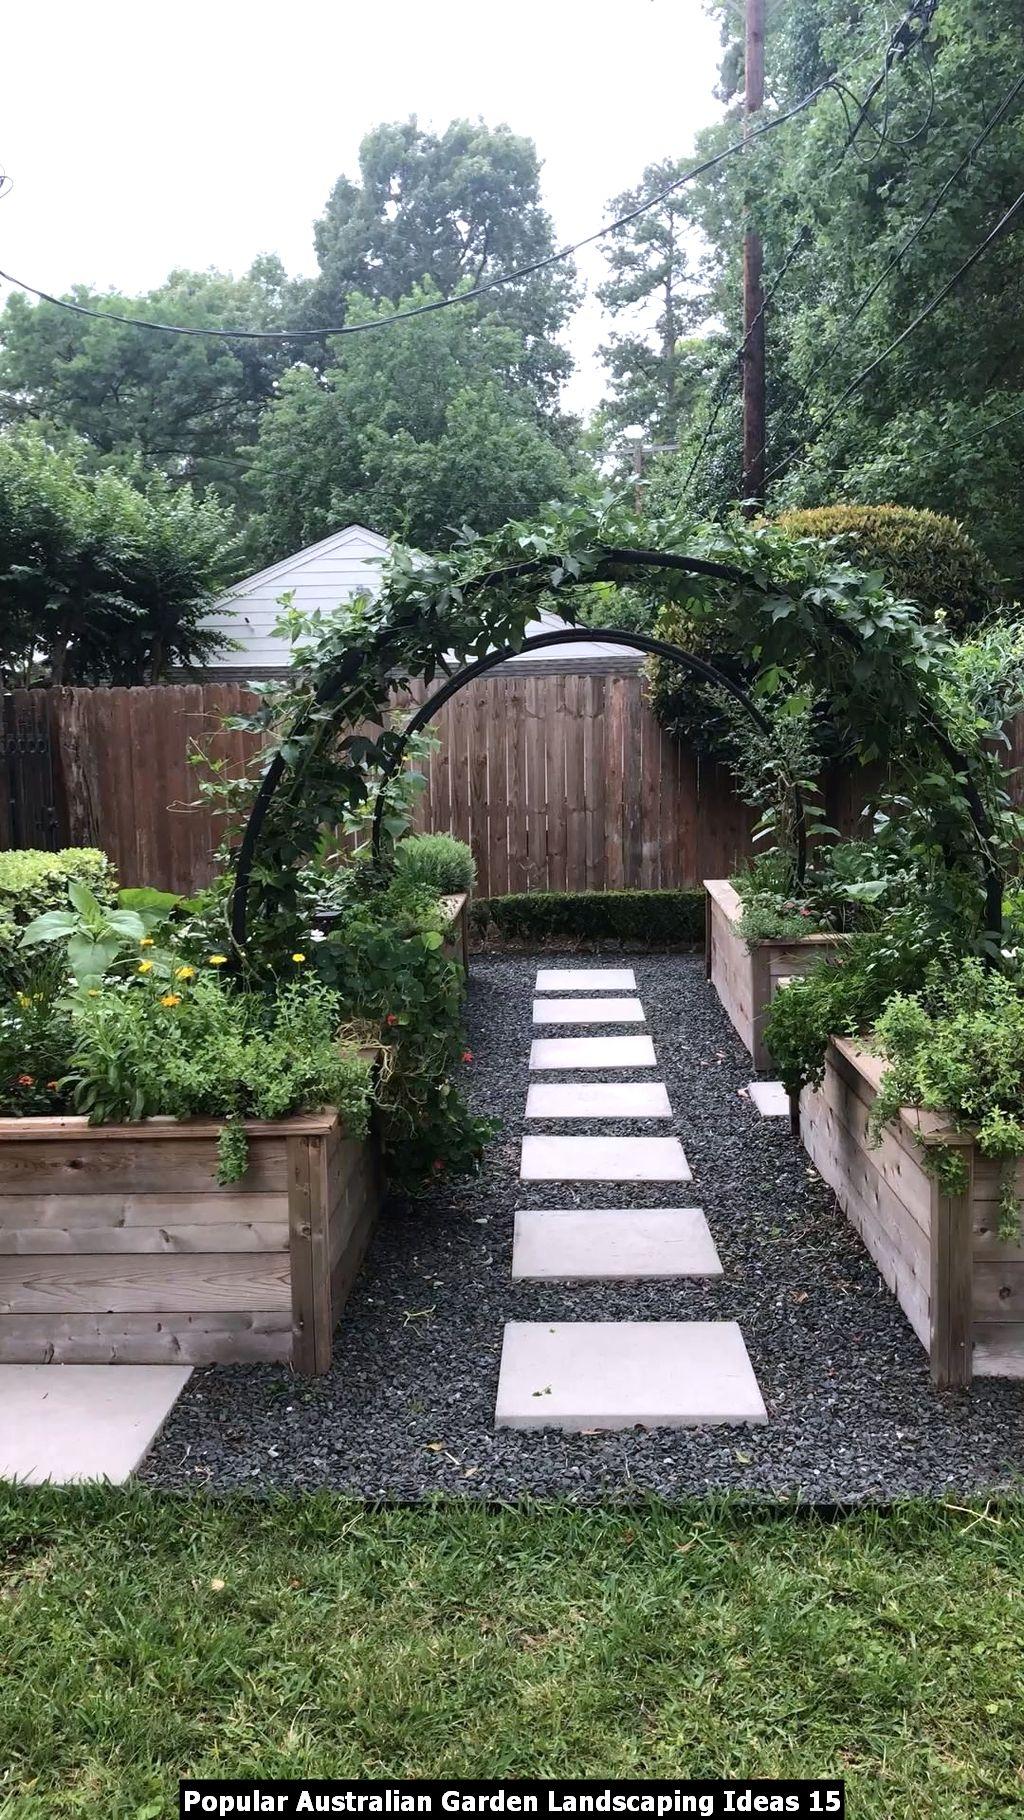 Popular Australian Garden Landscaping Ideas 15